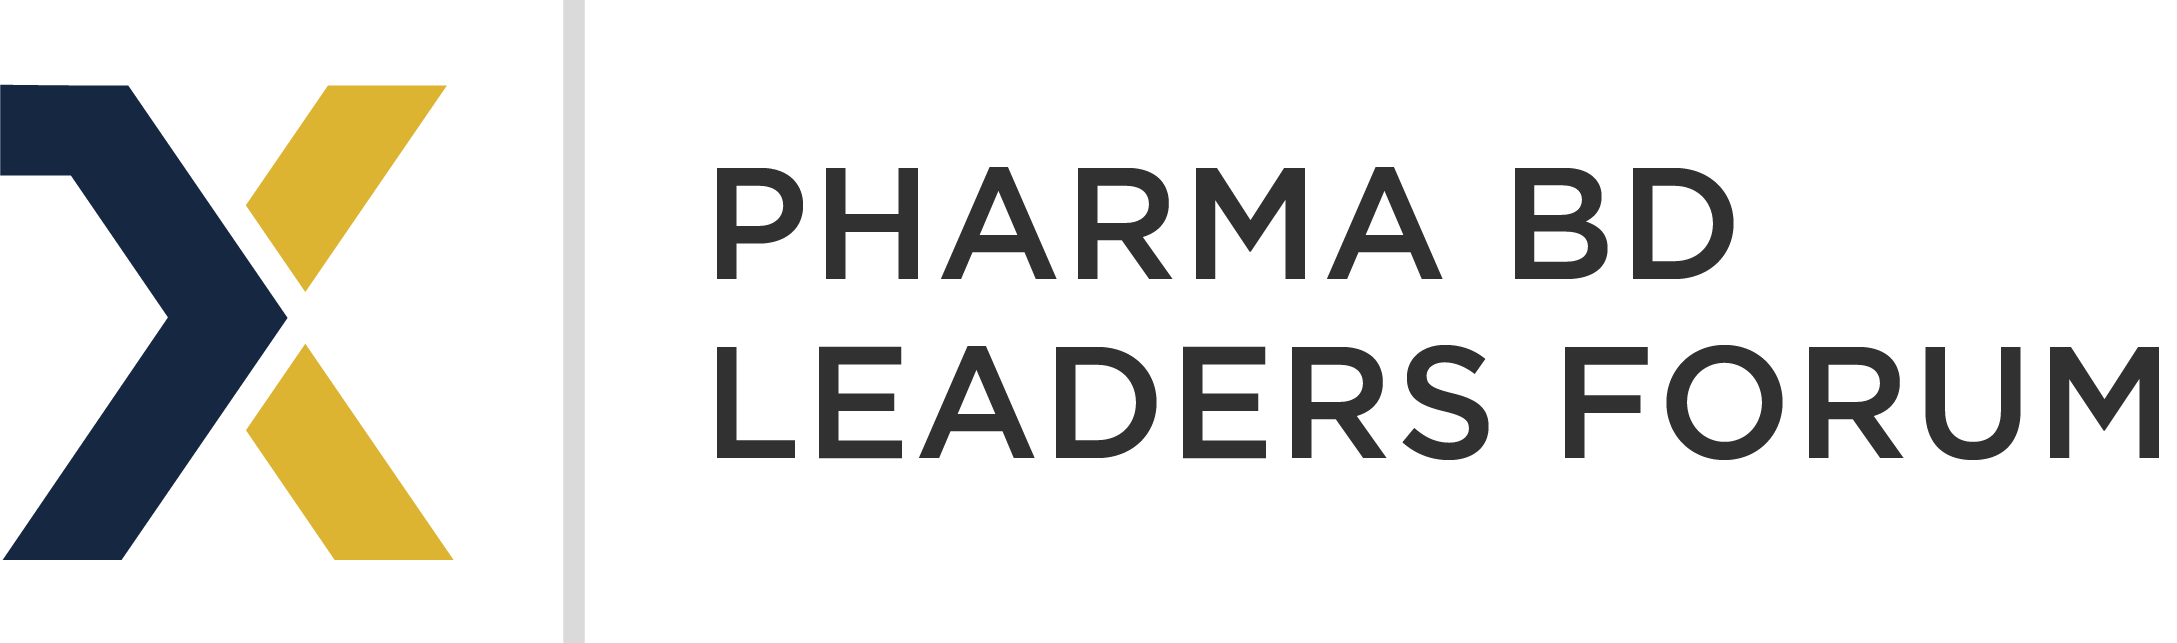 LSX Pharma BD Forum